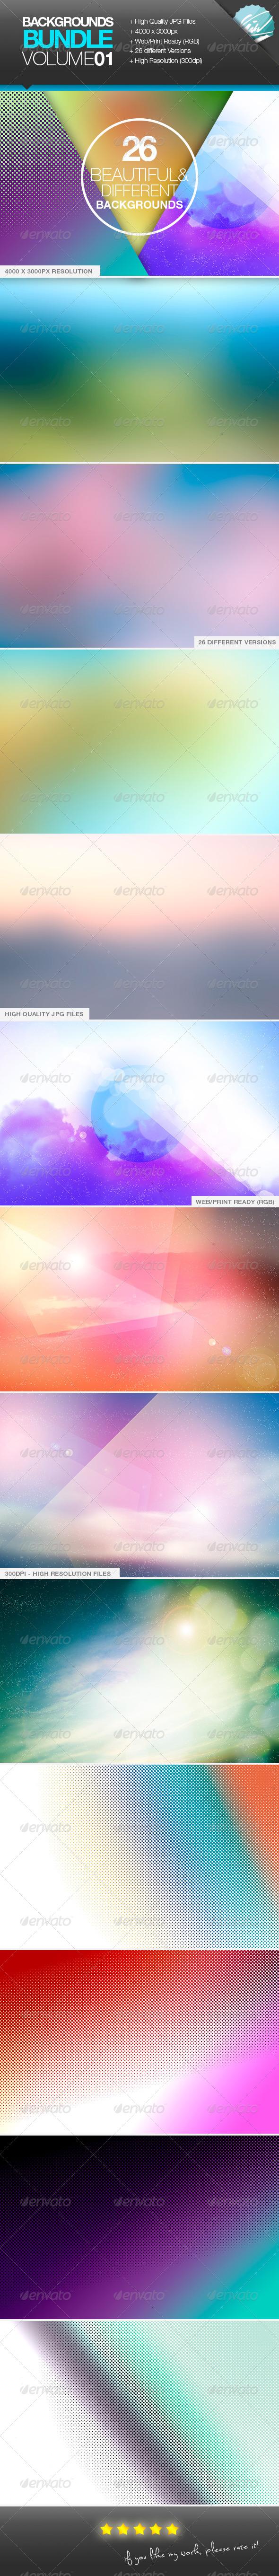 GraphicRiver Backgrounds Bundle Vol01 Dream Blurred Raster 7984094